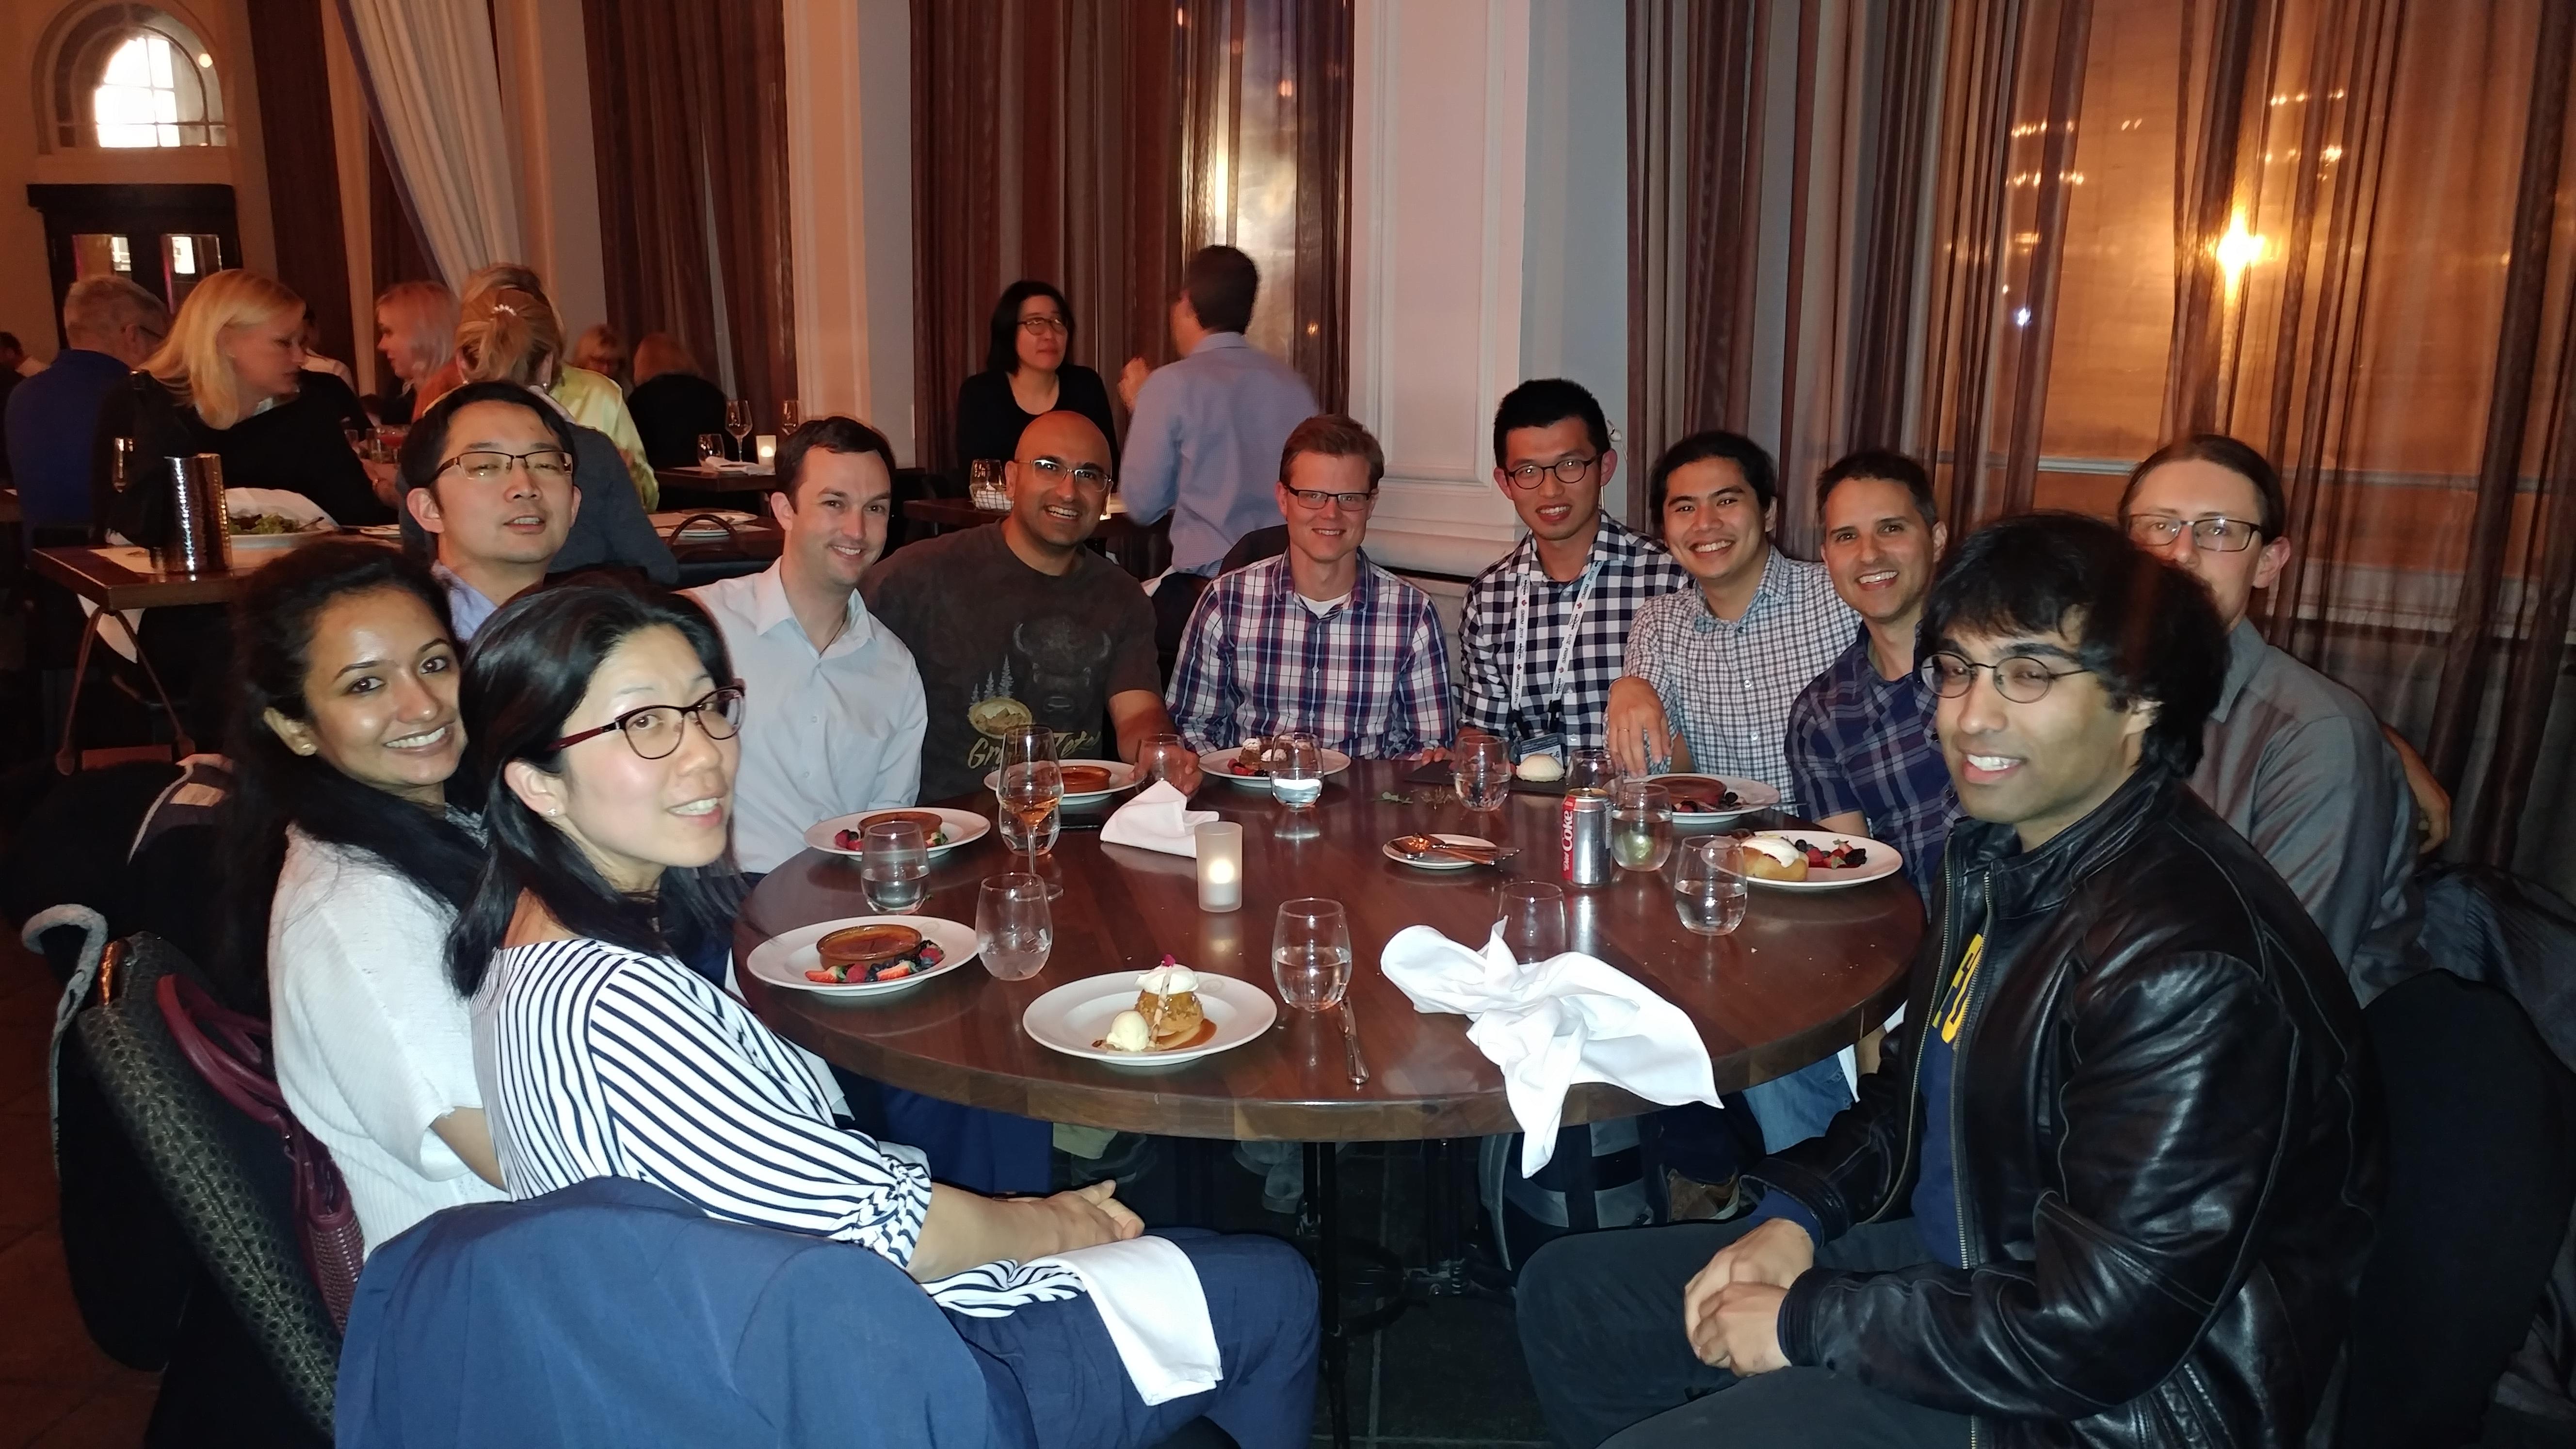 Peder Larson Group Advanced Imaging Technologies | UCSF